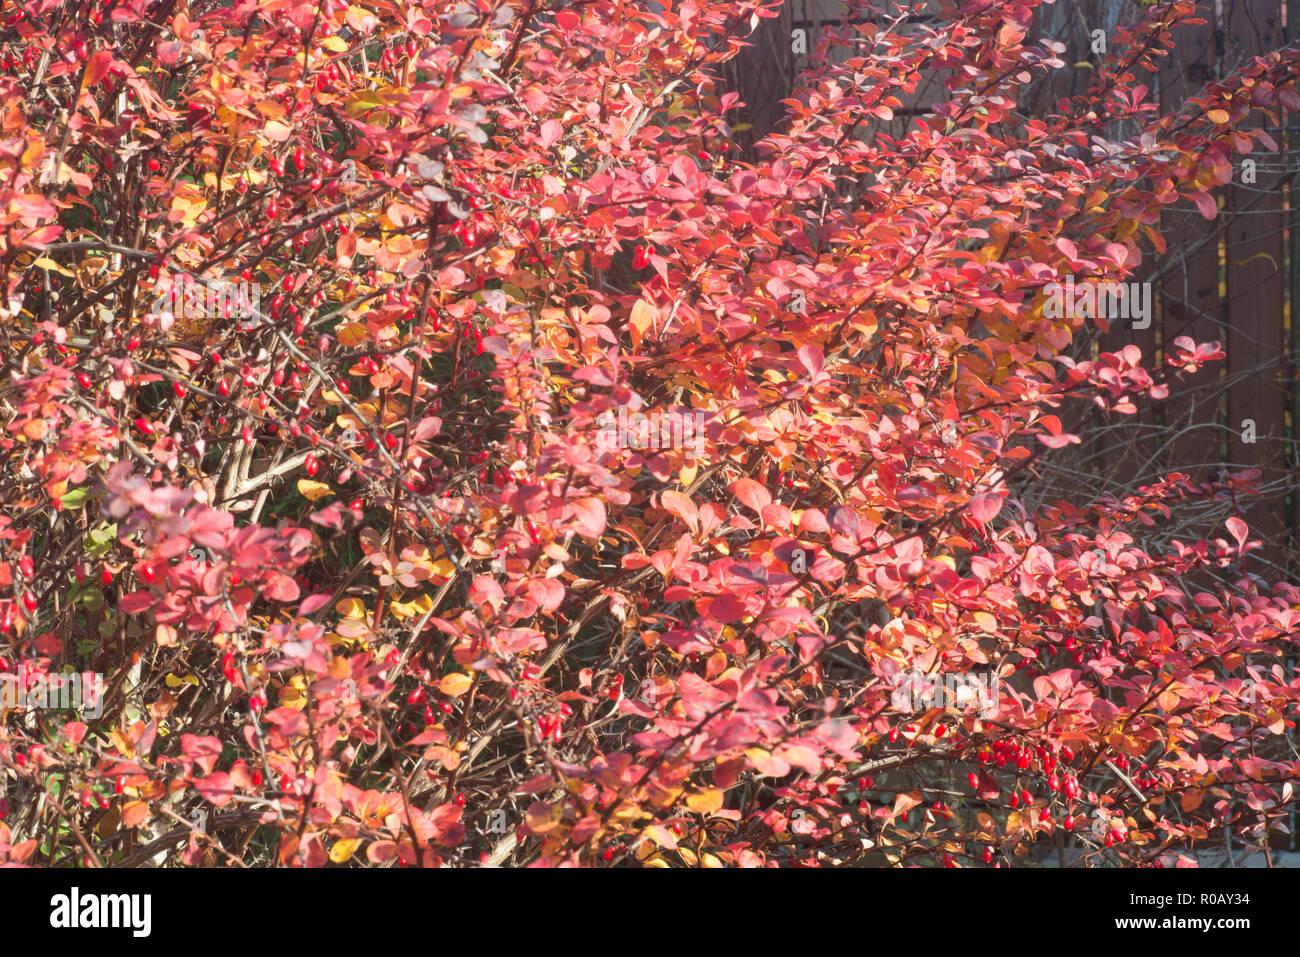 Berberis Barberry Evergreen Shrub Red Leaves On Sunny Autumn